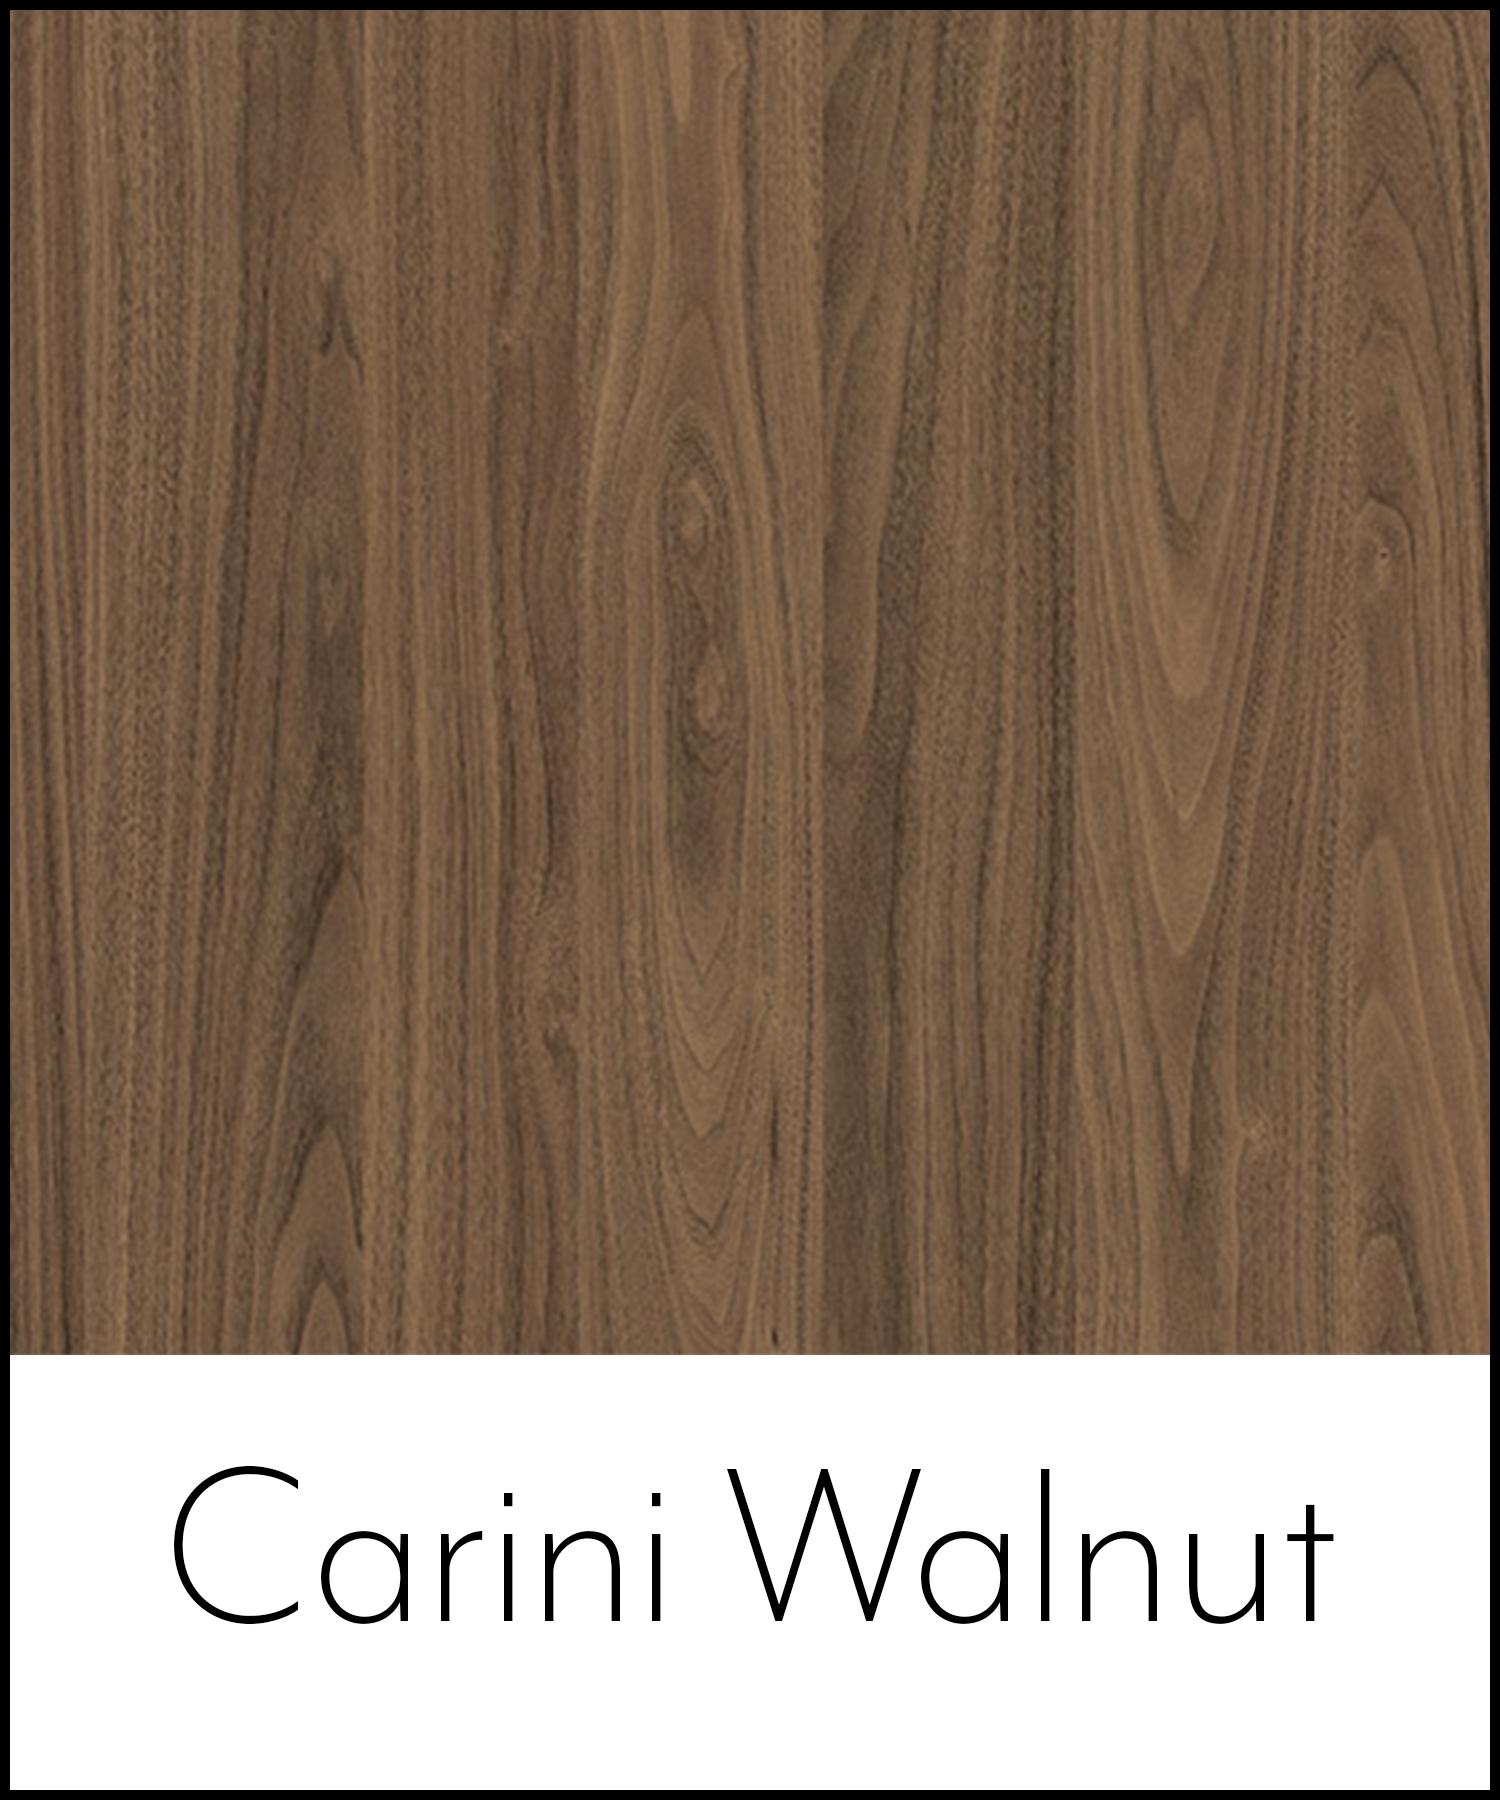 Carini Walnut.jpg